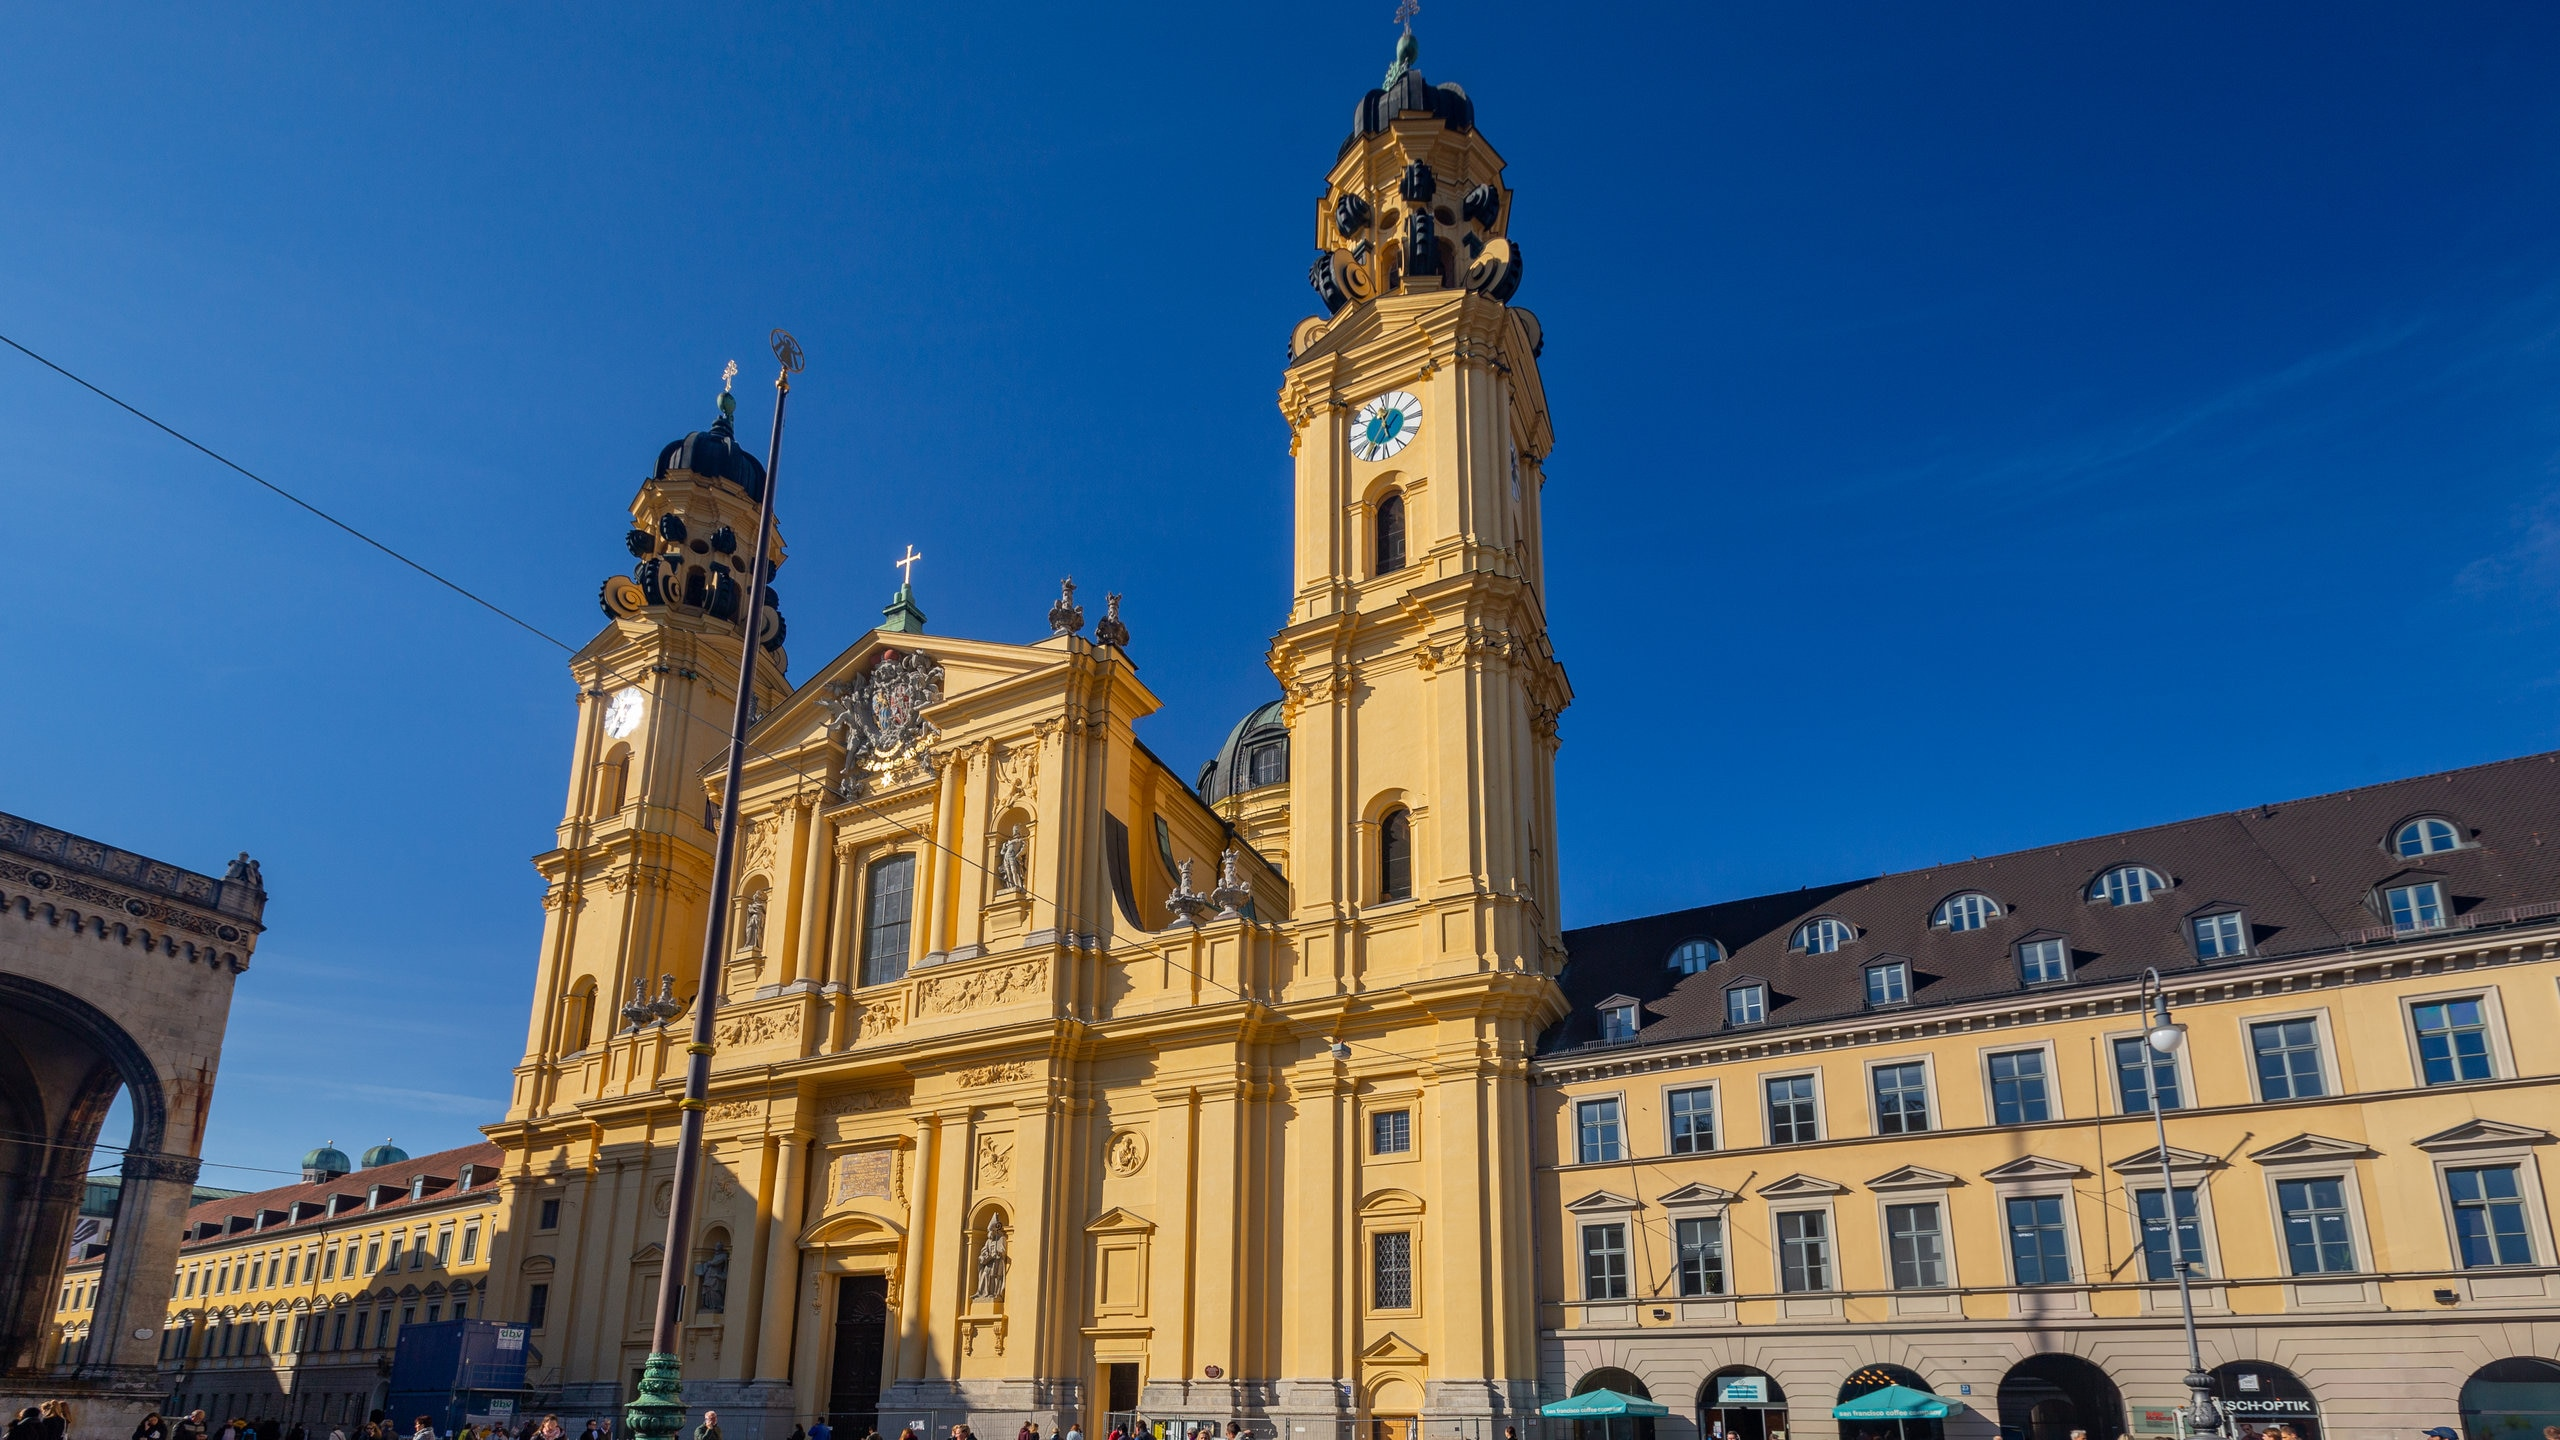 Theatinerkirche, Munich, Bavaria, Germany